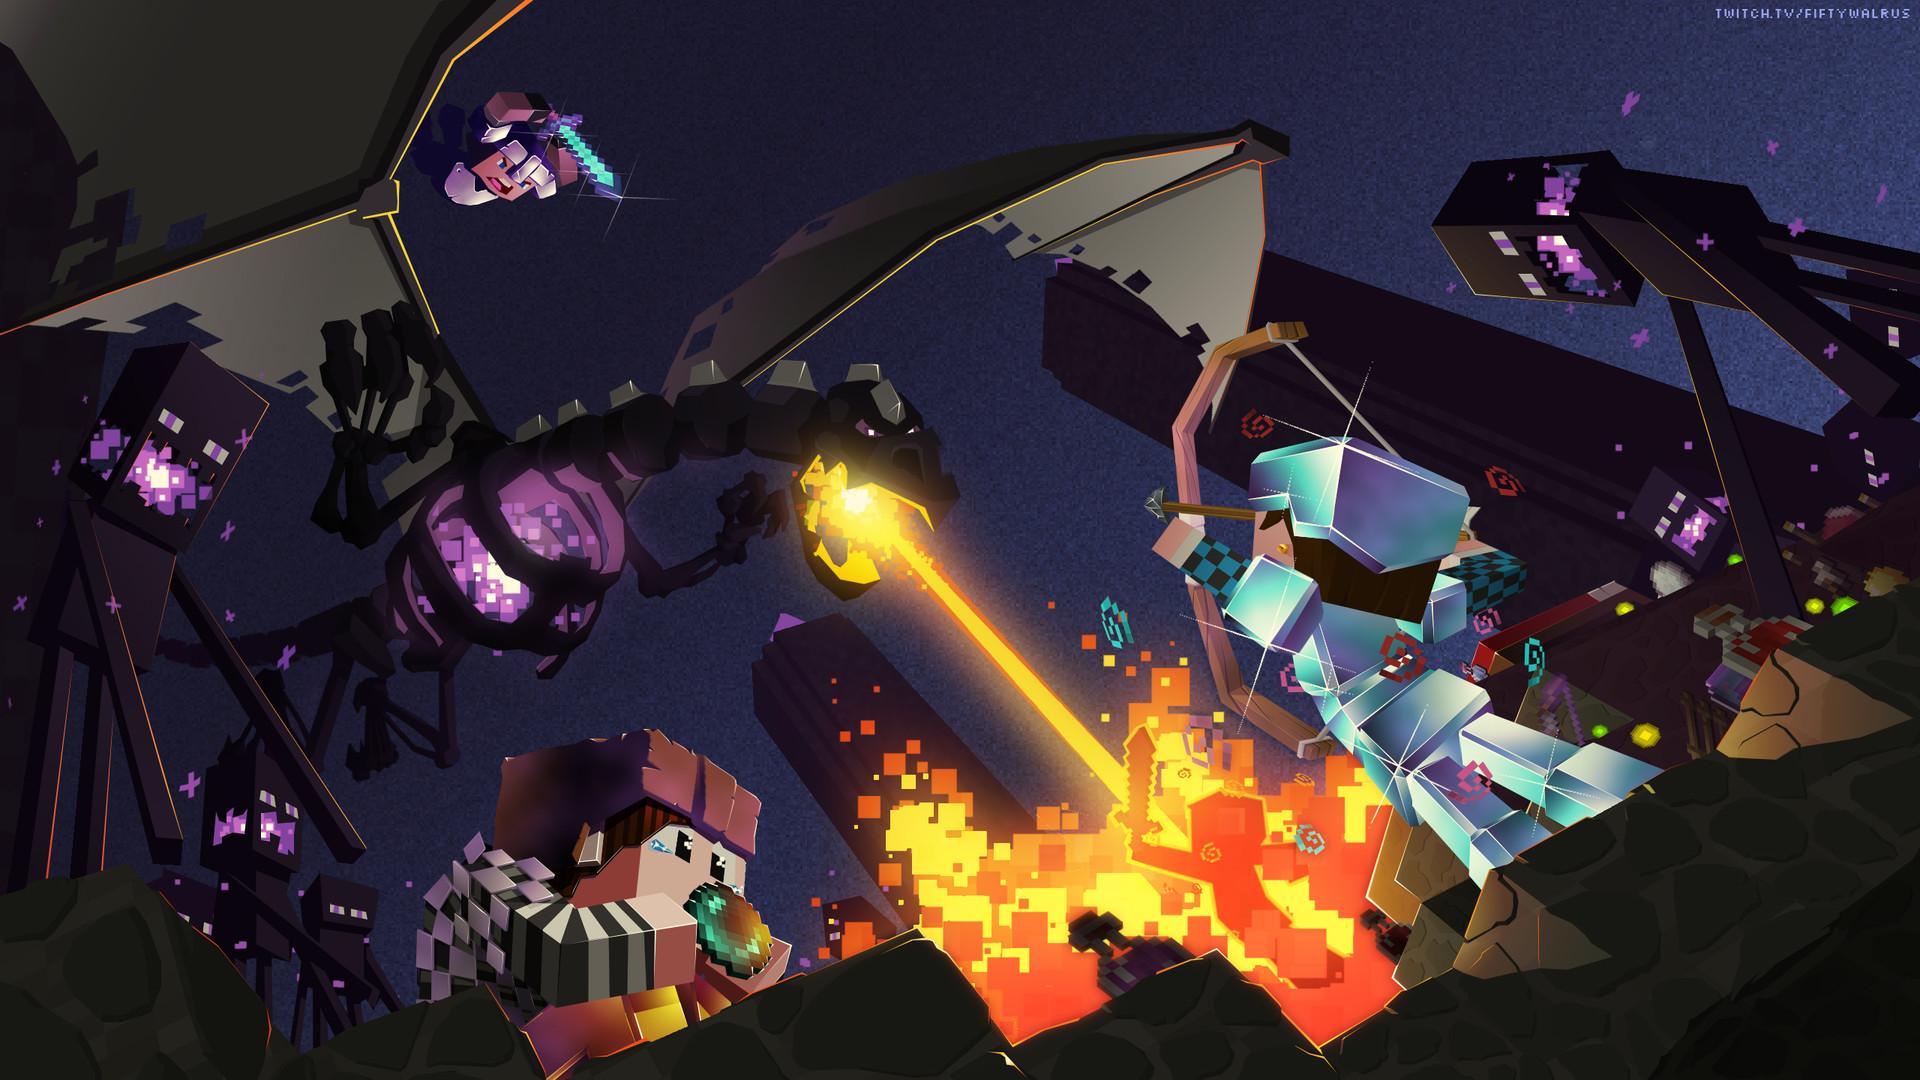 Monster Hunter Girl Wallpaper 1440 Artstation Minecraft Fan Art Kalvin Lyle